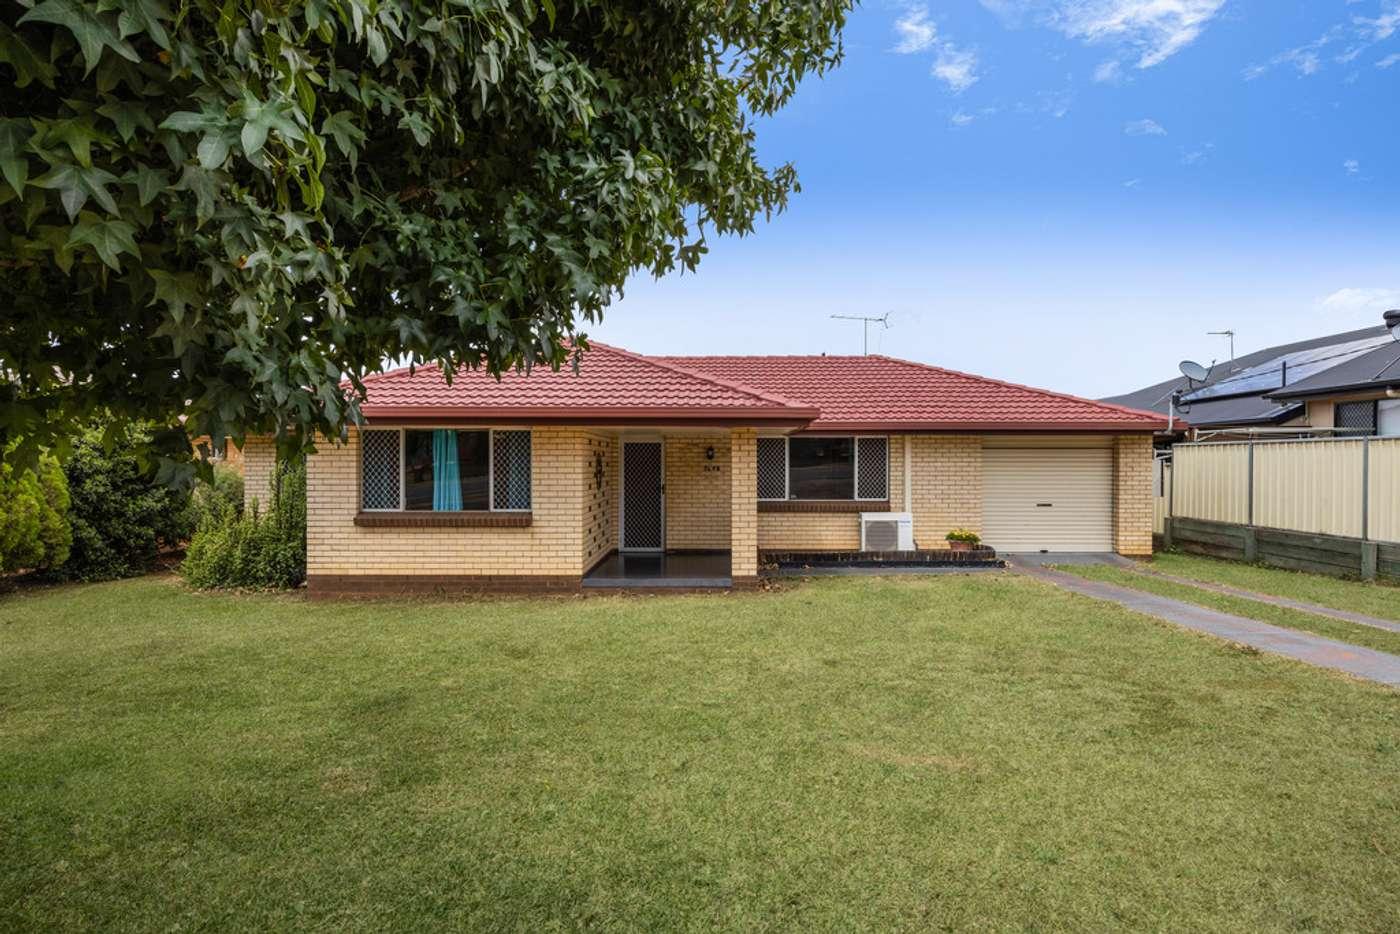 Main view of Homely house listing, 364B Bridge Street, Wilsonton QLD 4350